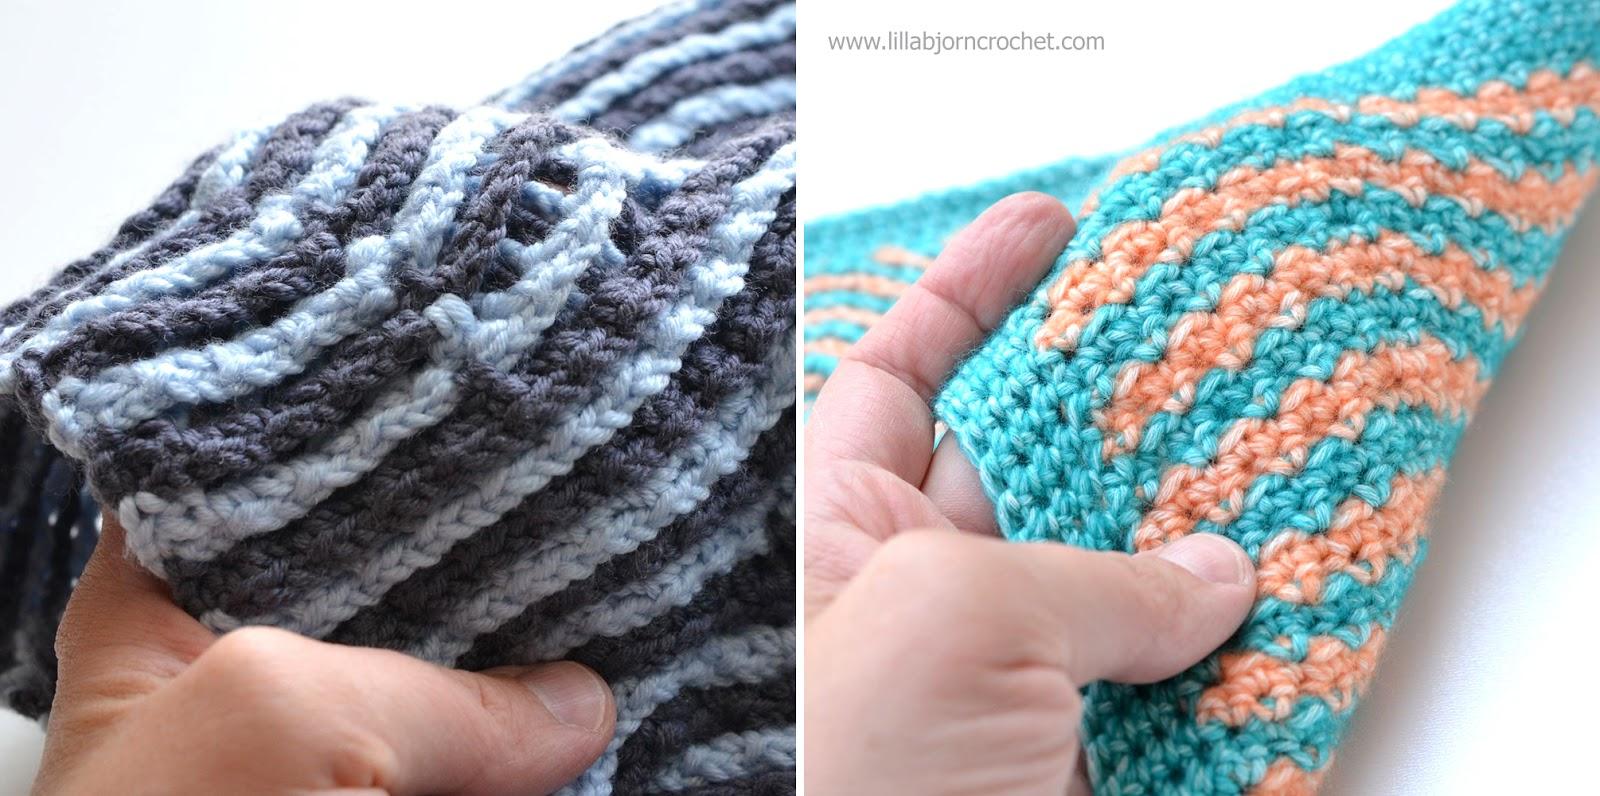 Brioche Crochet: to support the trend | LillaBjörn\'s Crochet World